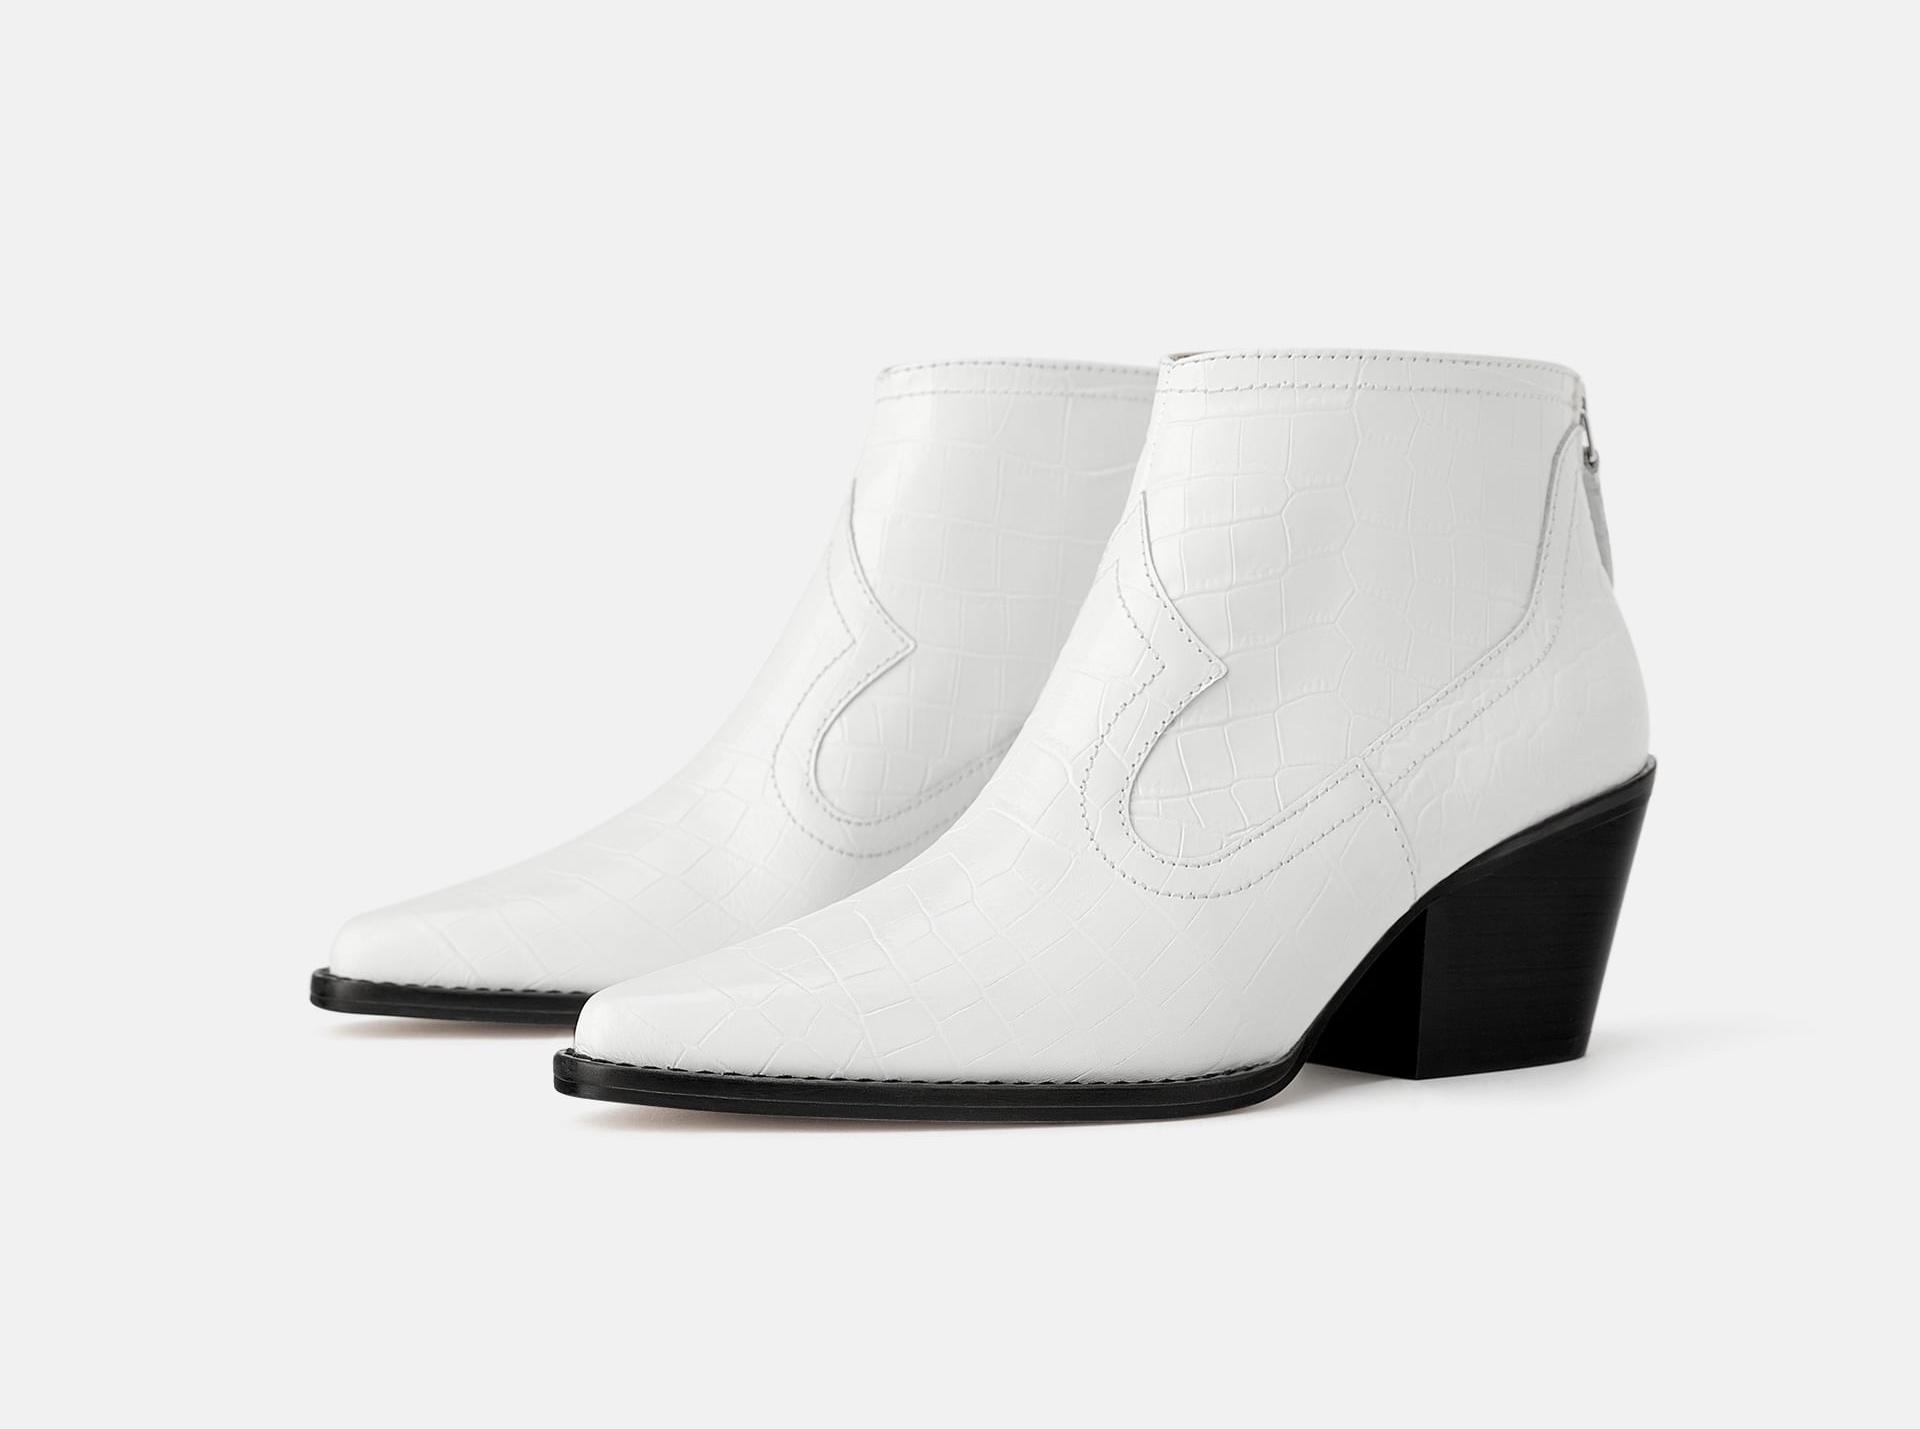 zara-mock-croc-cowboy-ankle-boots